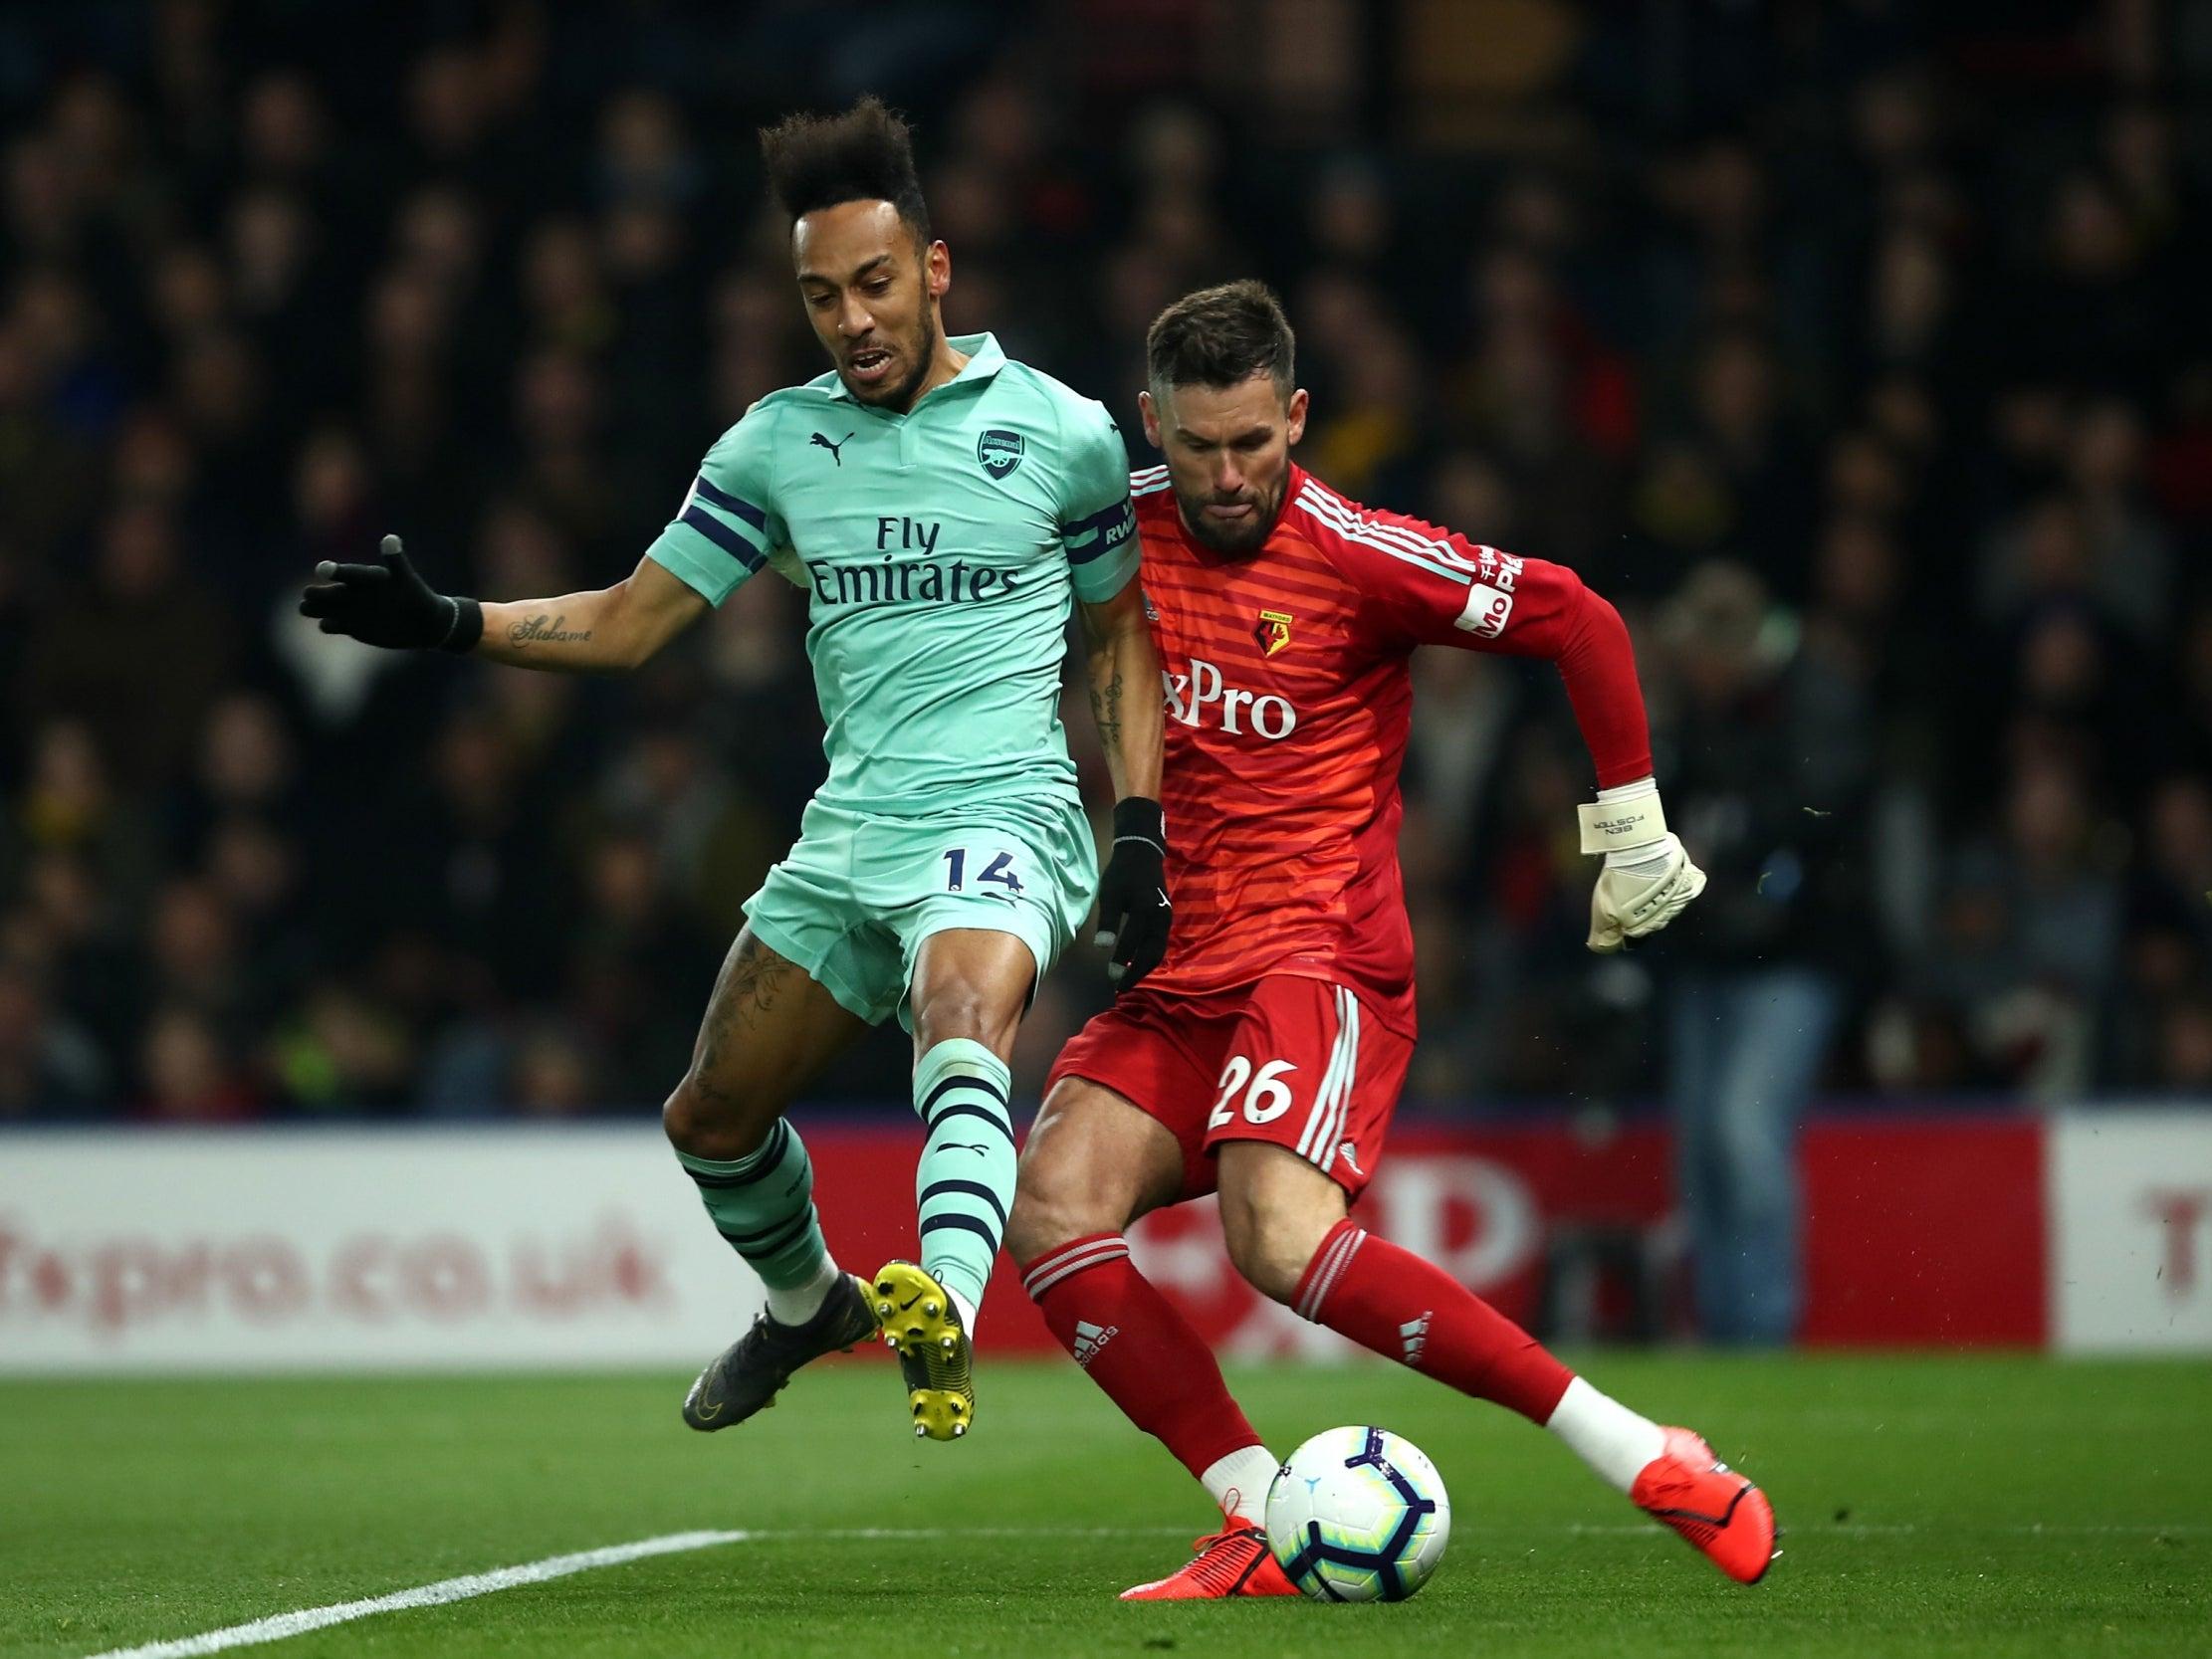 1a6c3a80e64d4 Watford vs Arsenal result  Pierre-Emerick Aubameyang pounces on Ben Foster  error to earn vital points